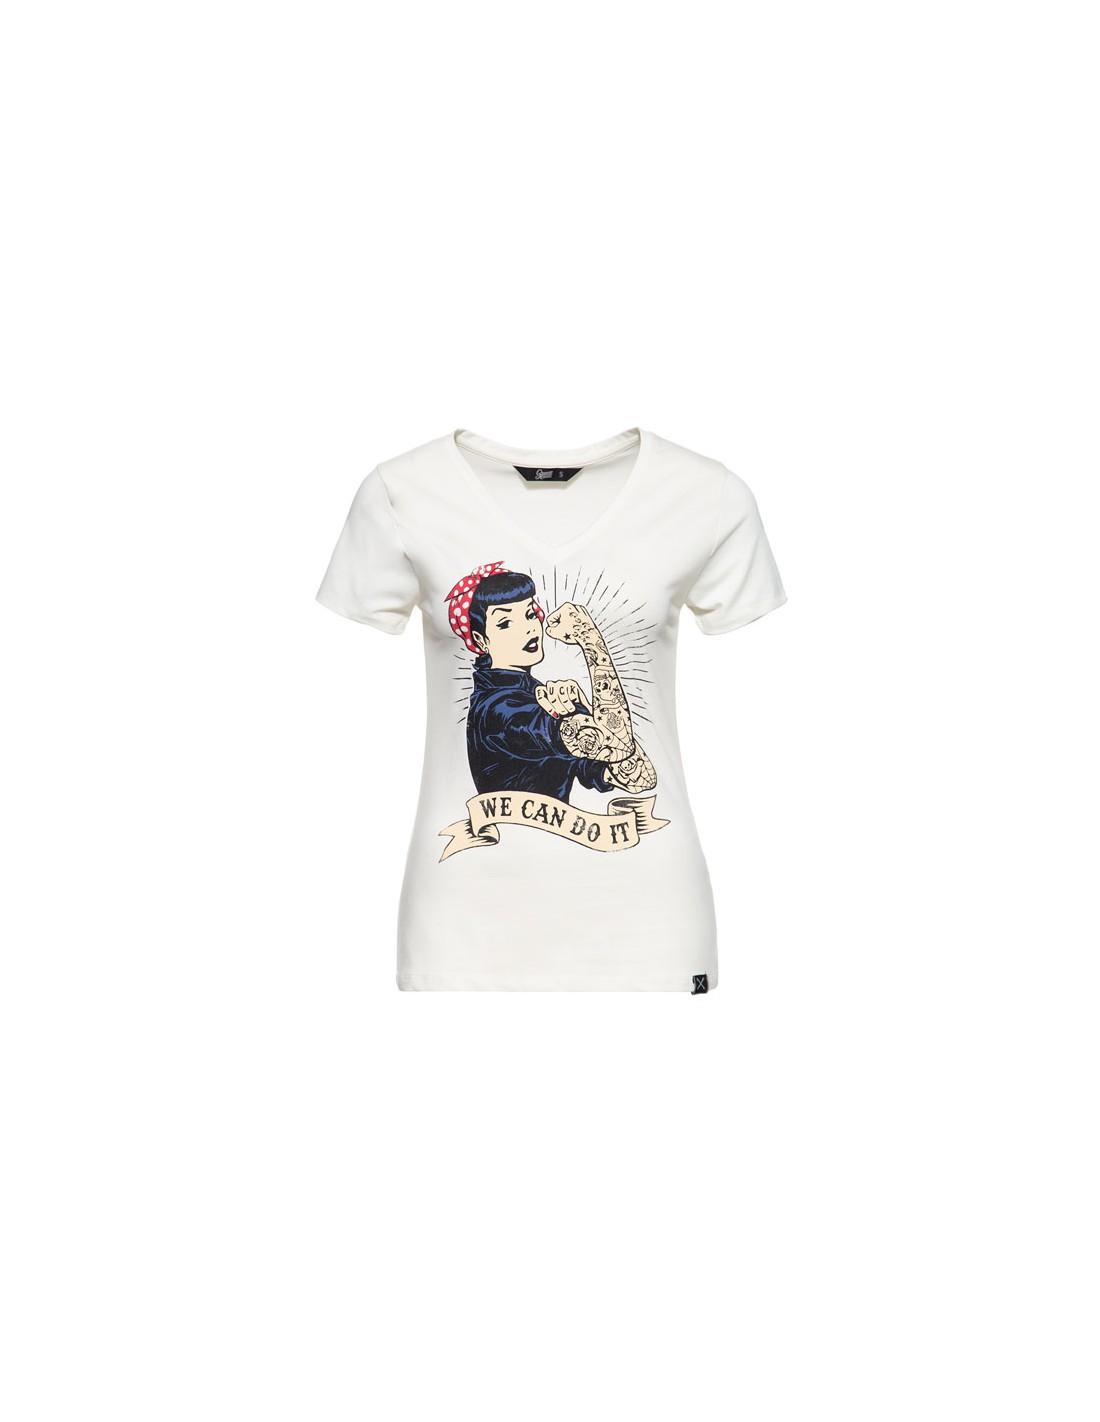 King Kerosin Queen Kerosin Female Damen Dip Dye Shirt The Holy Ride White